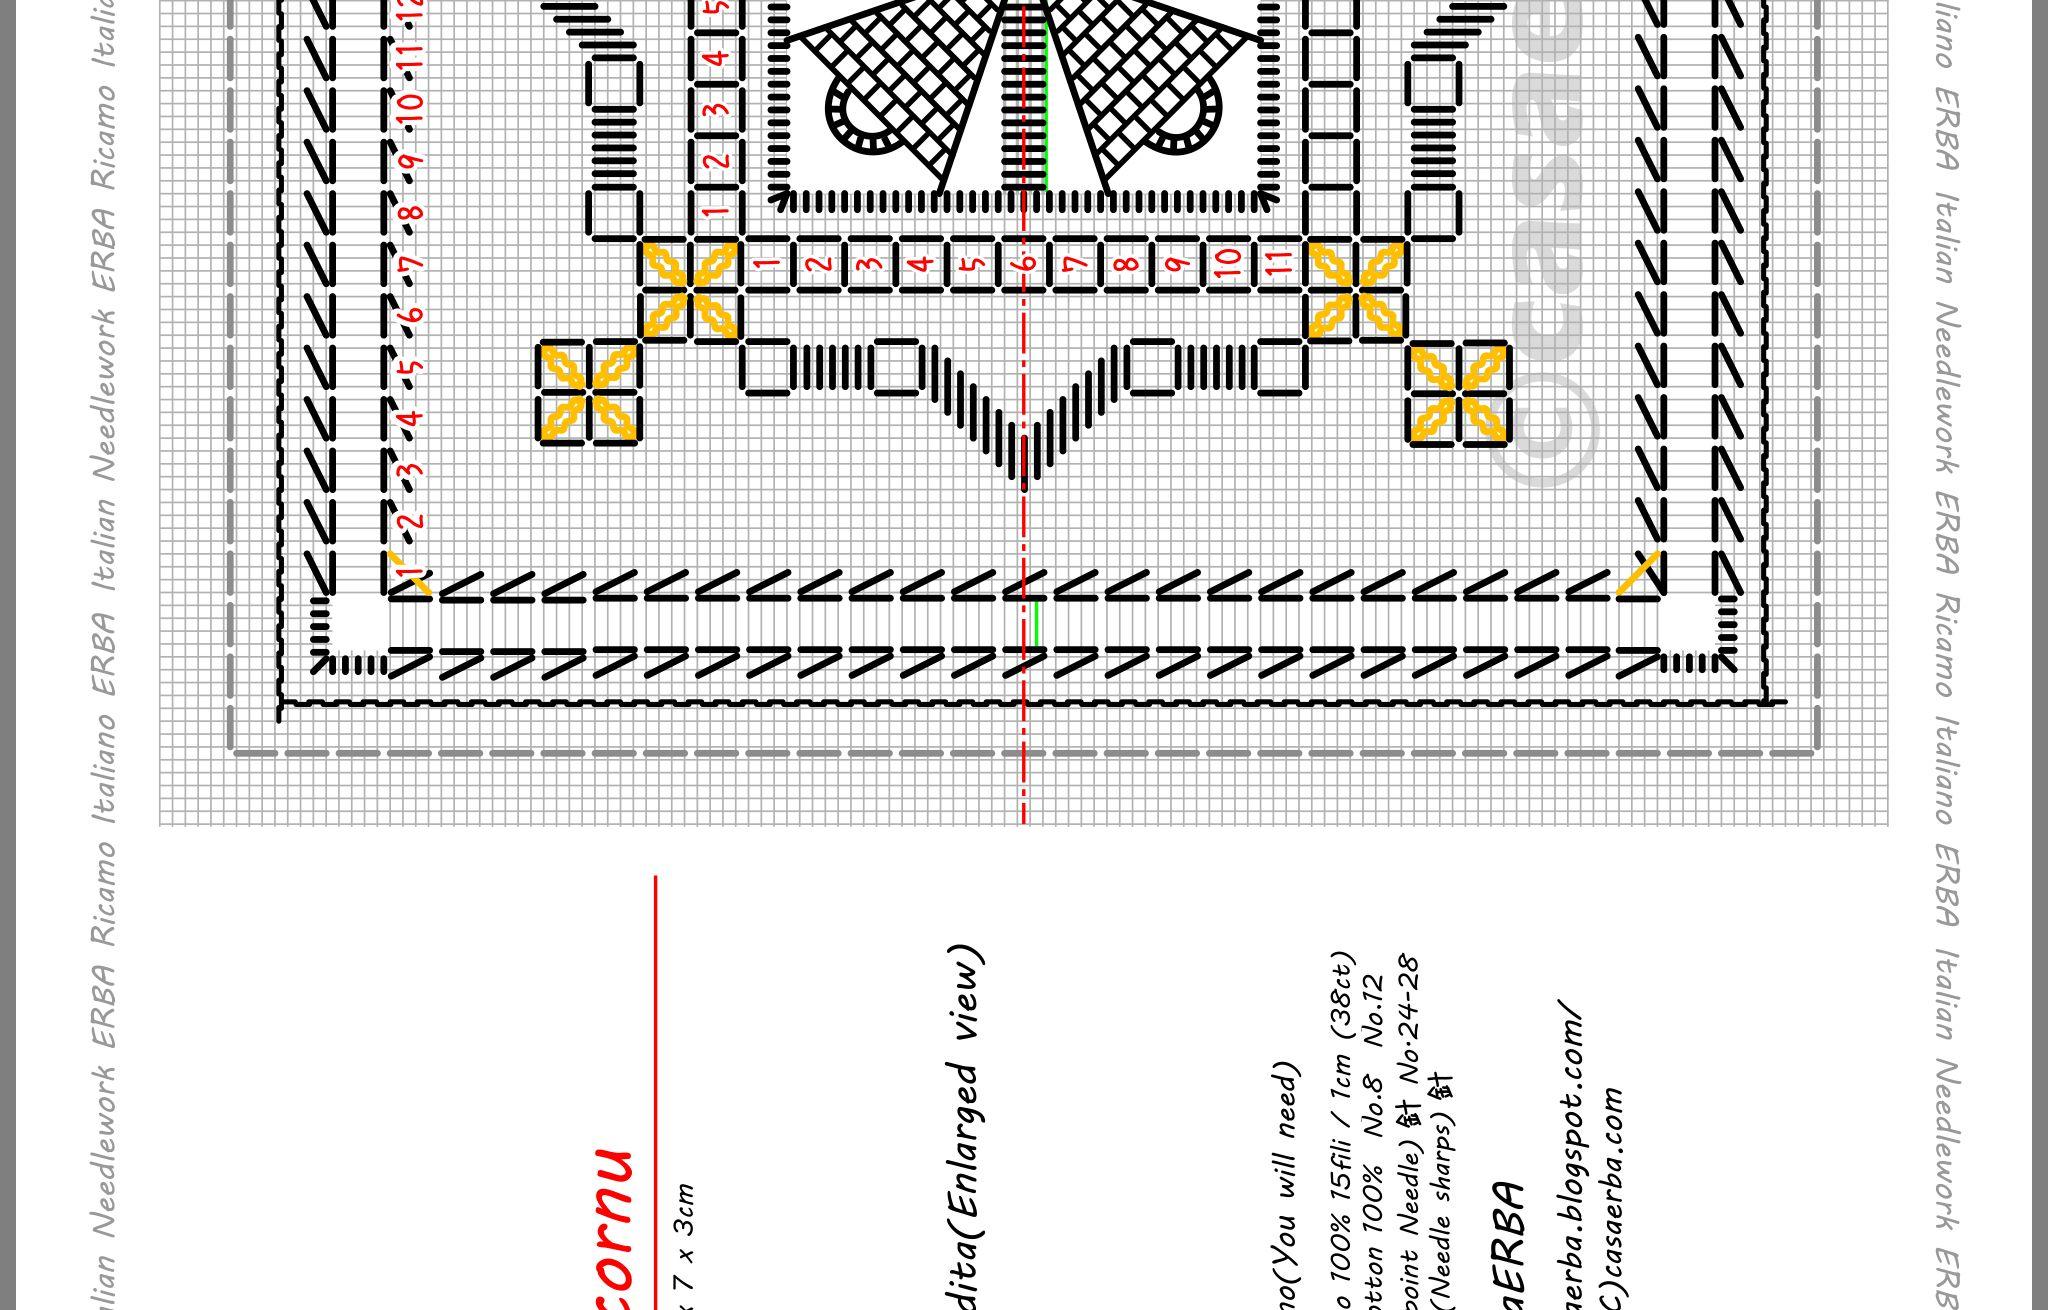 Pin By Joye Hatfield On Patterns